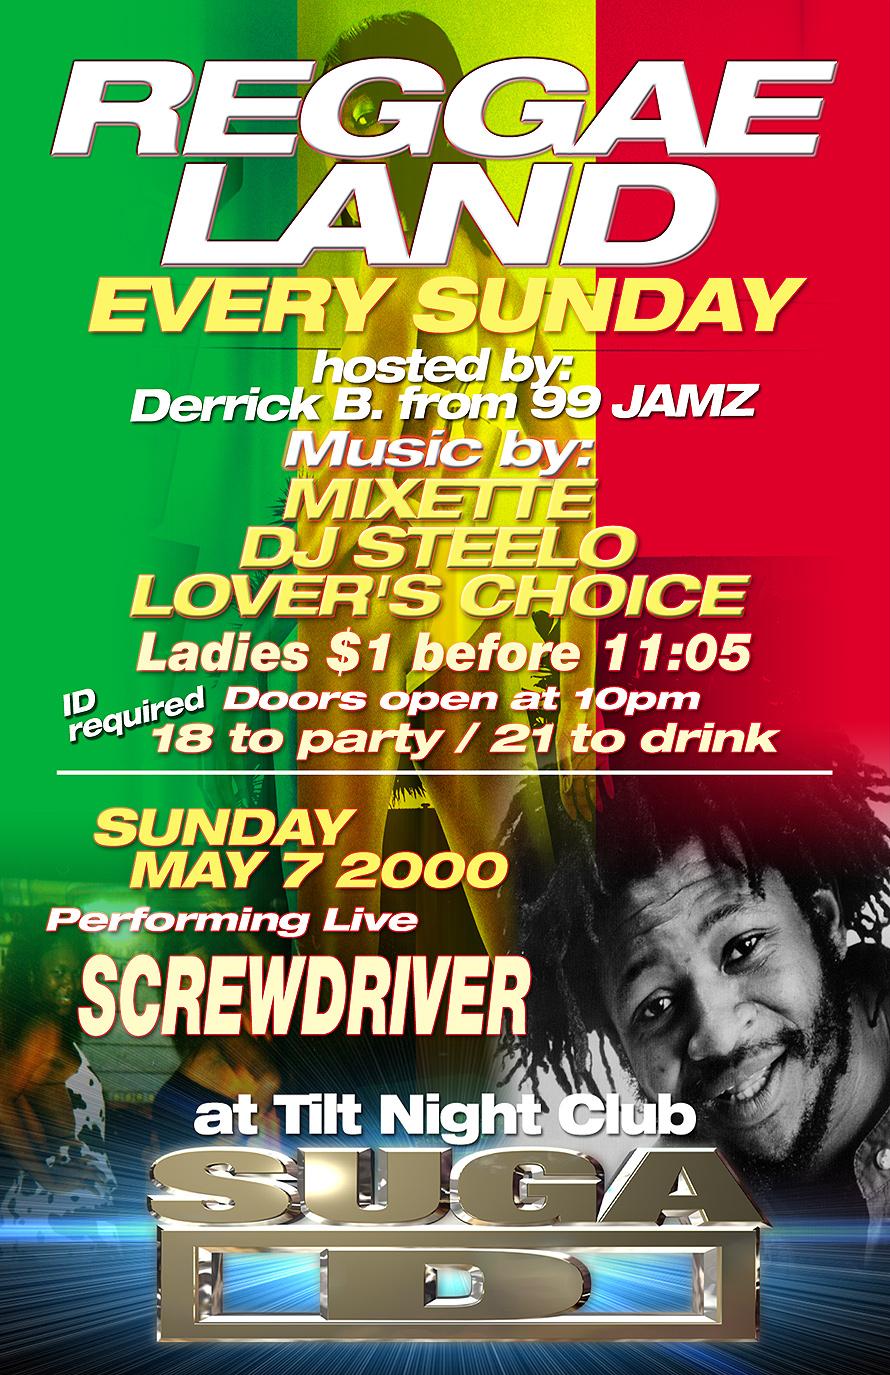 Reggae Land Every Sunday at Tilt Nightclub